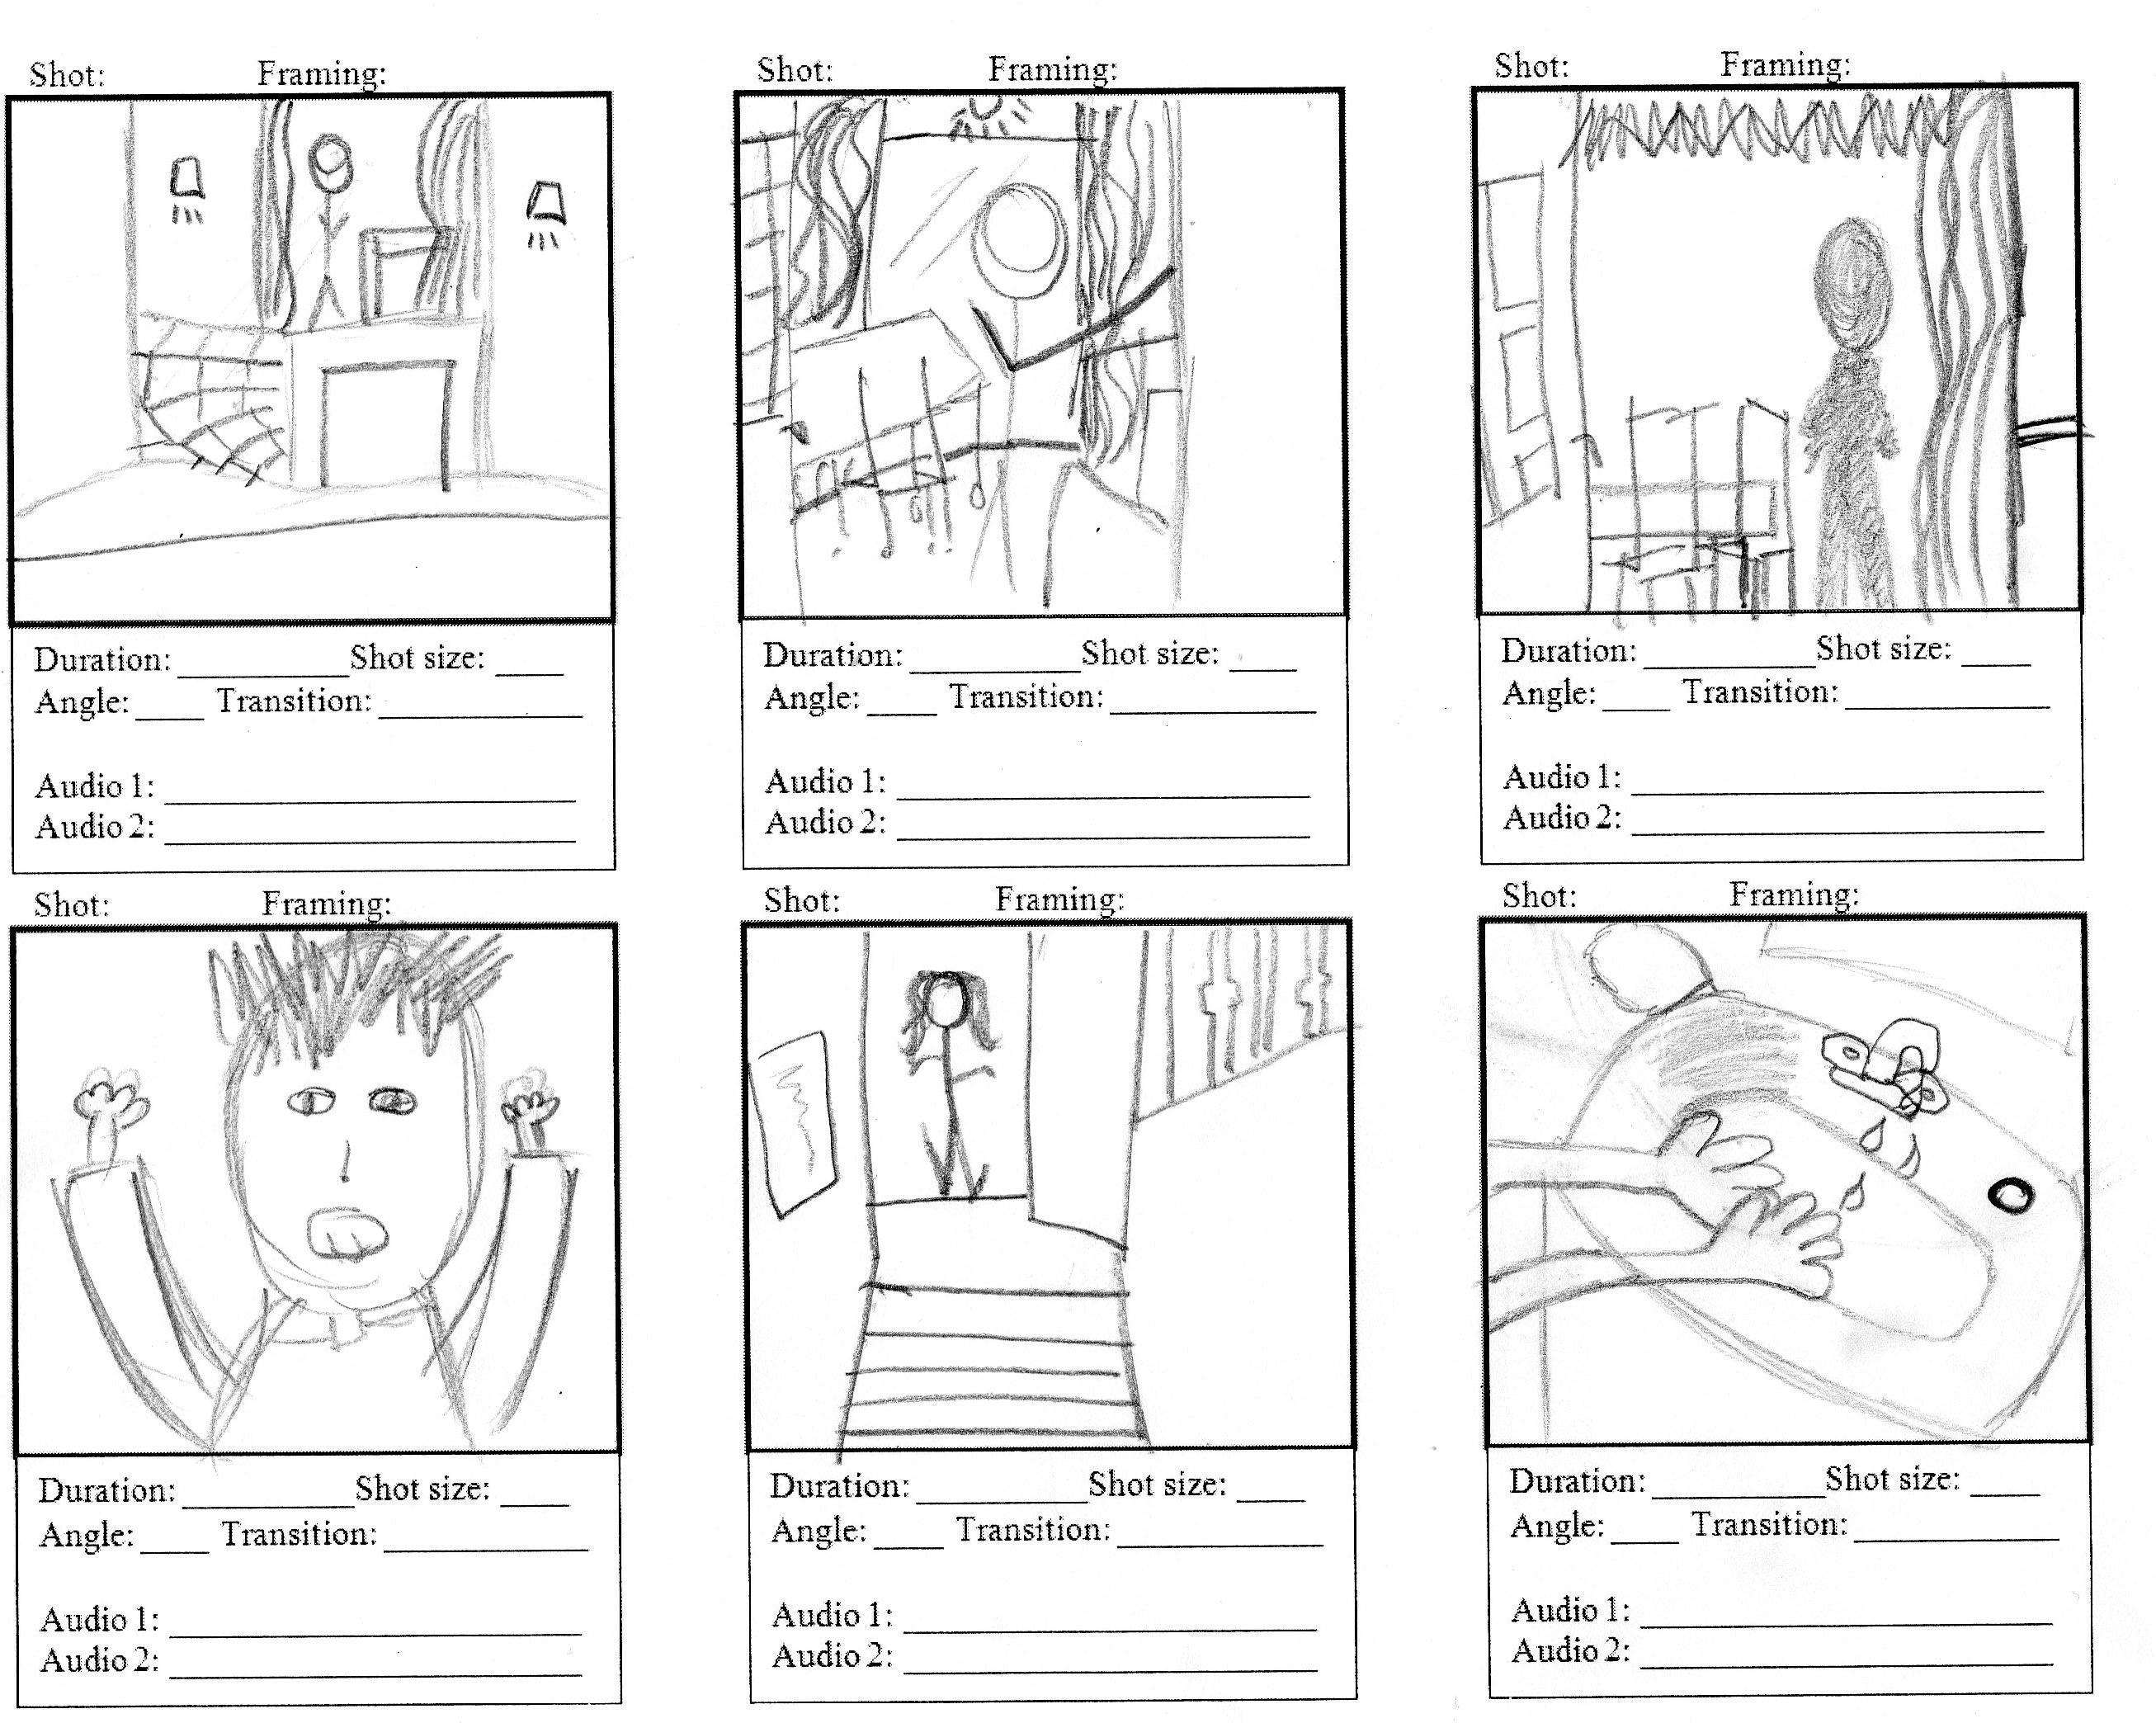 Planning: Storyboard